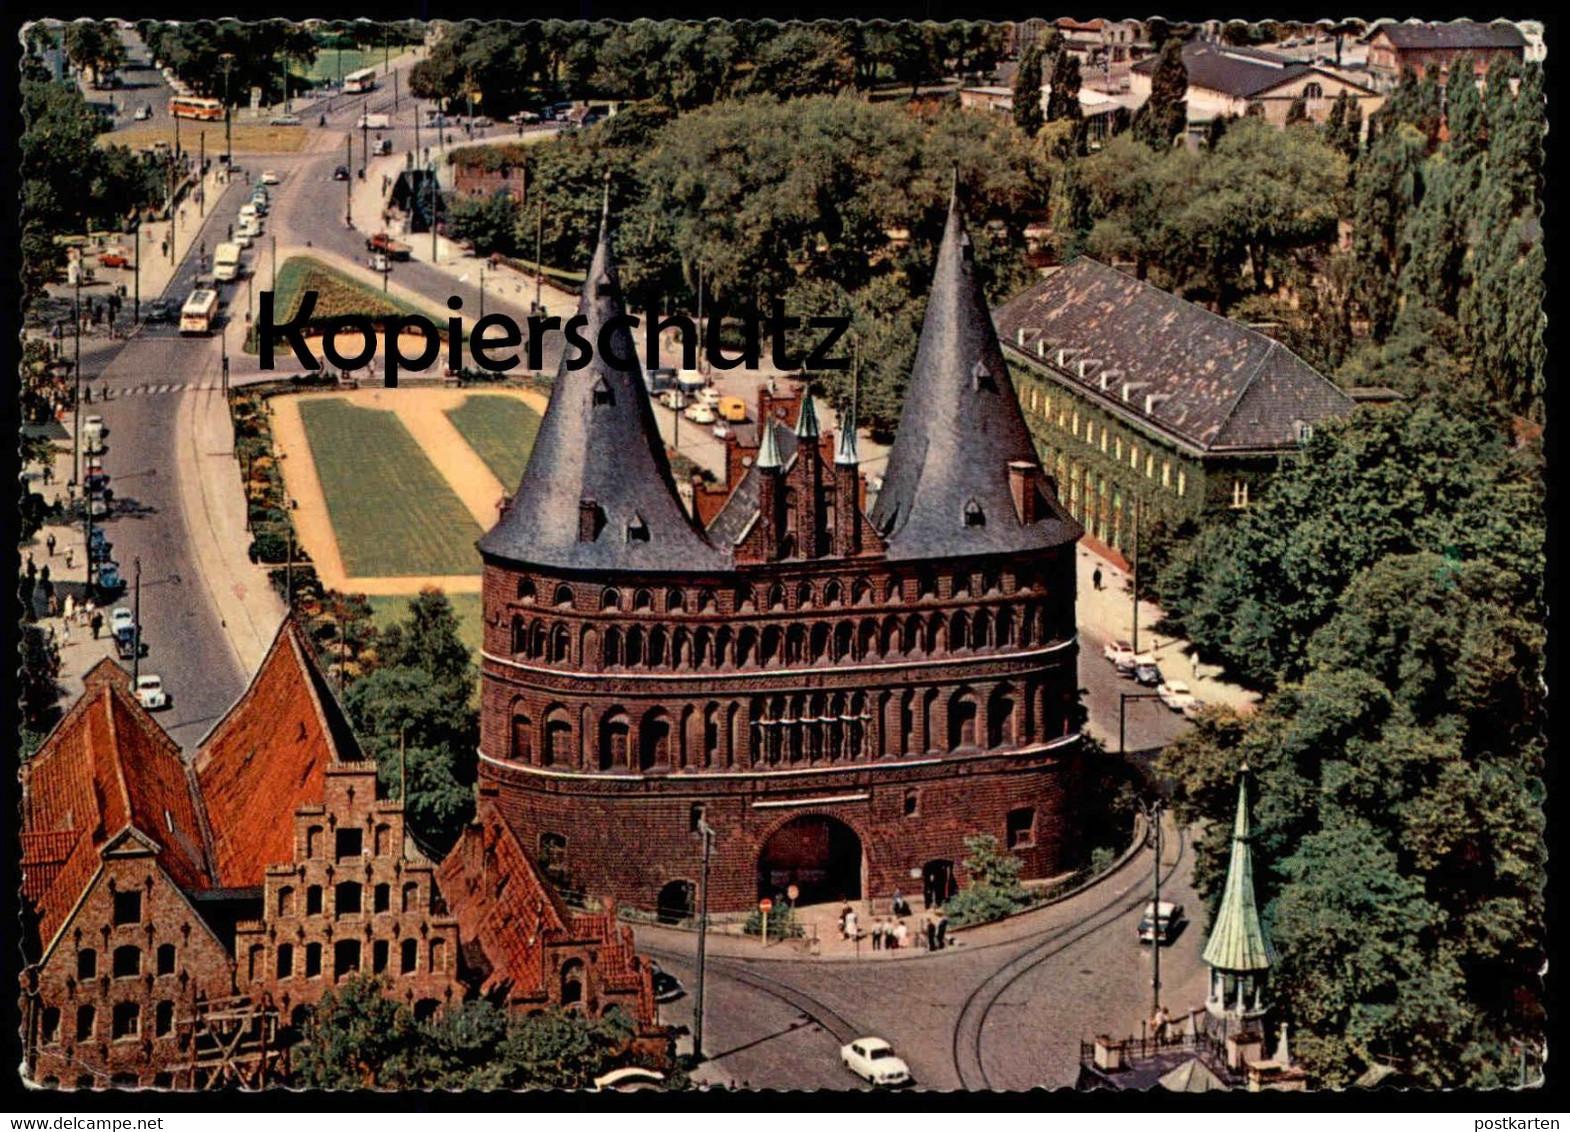 ÄLTERE POSTKARTE LÜBECK HOLSTENTOR & SALZSPEICHER TOR 1963 Gate Porte cpa postcard AK Ansichtskarte Luebeck Lubeck